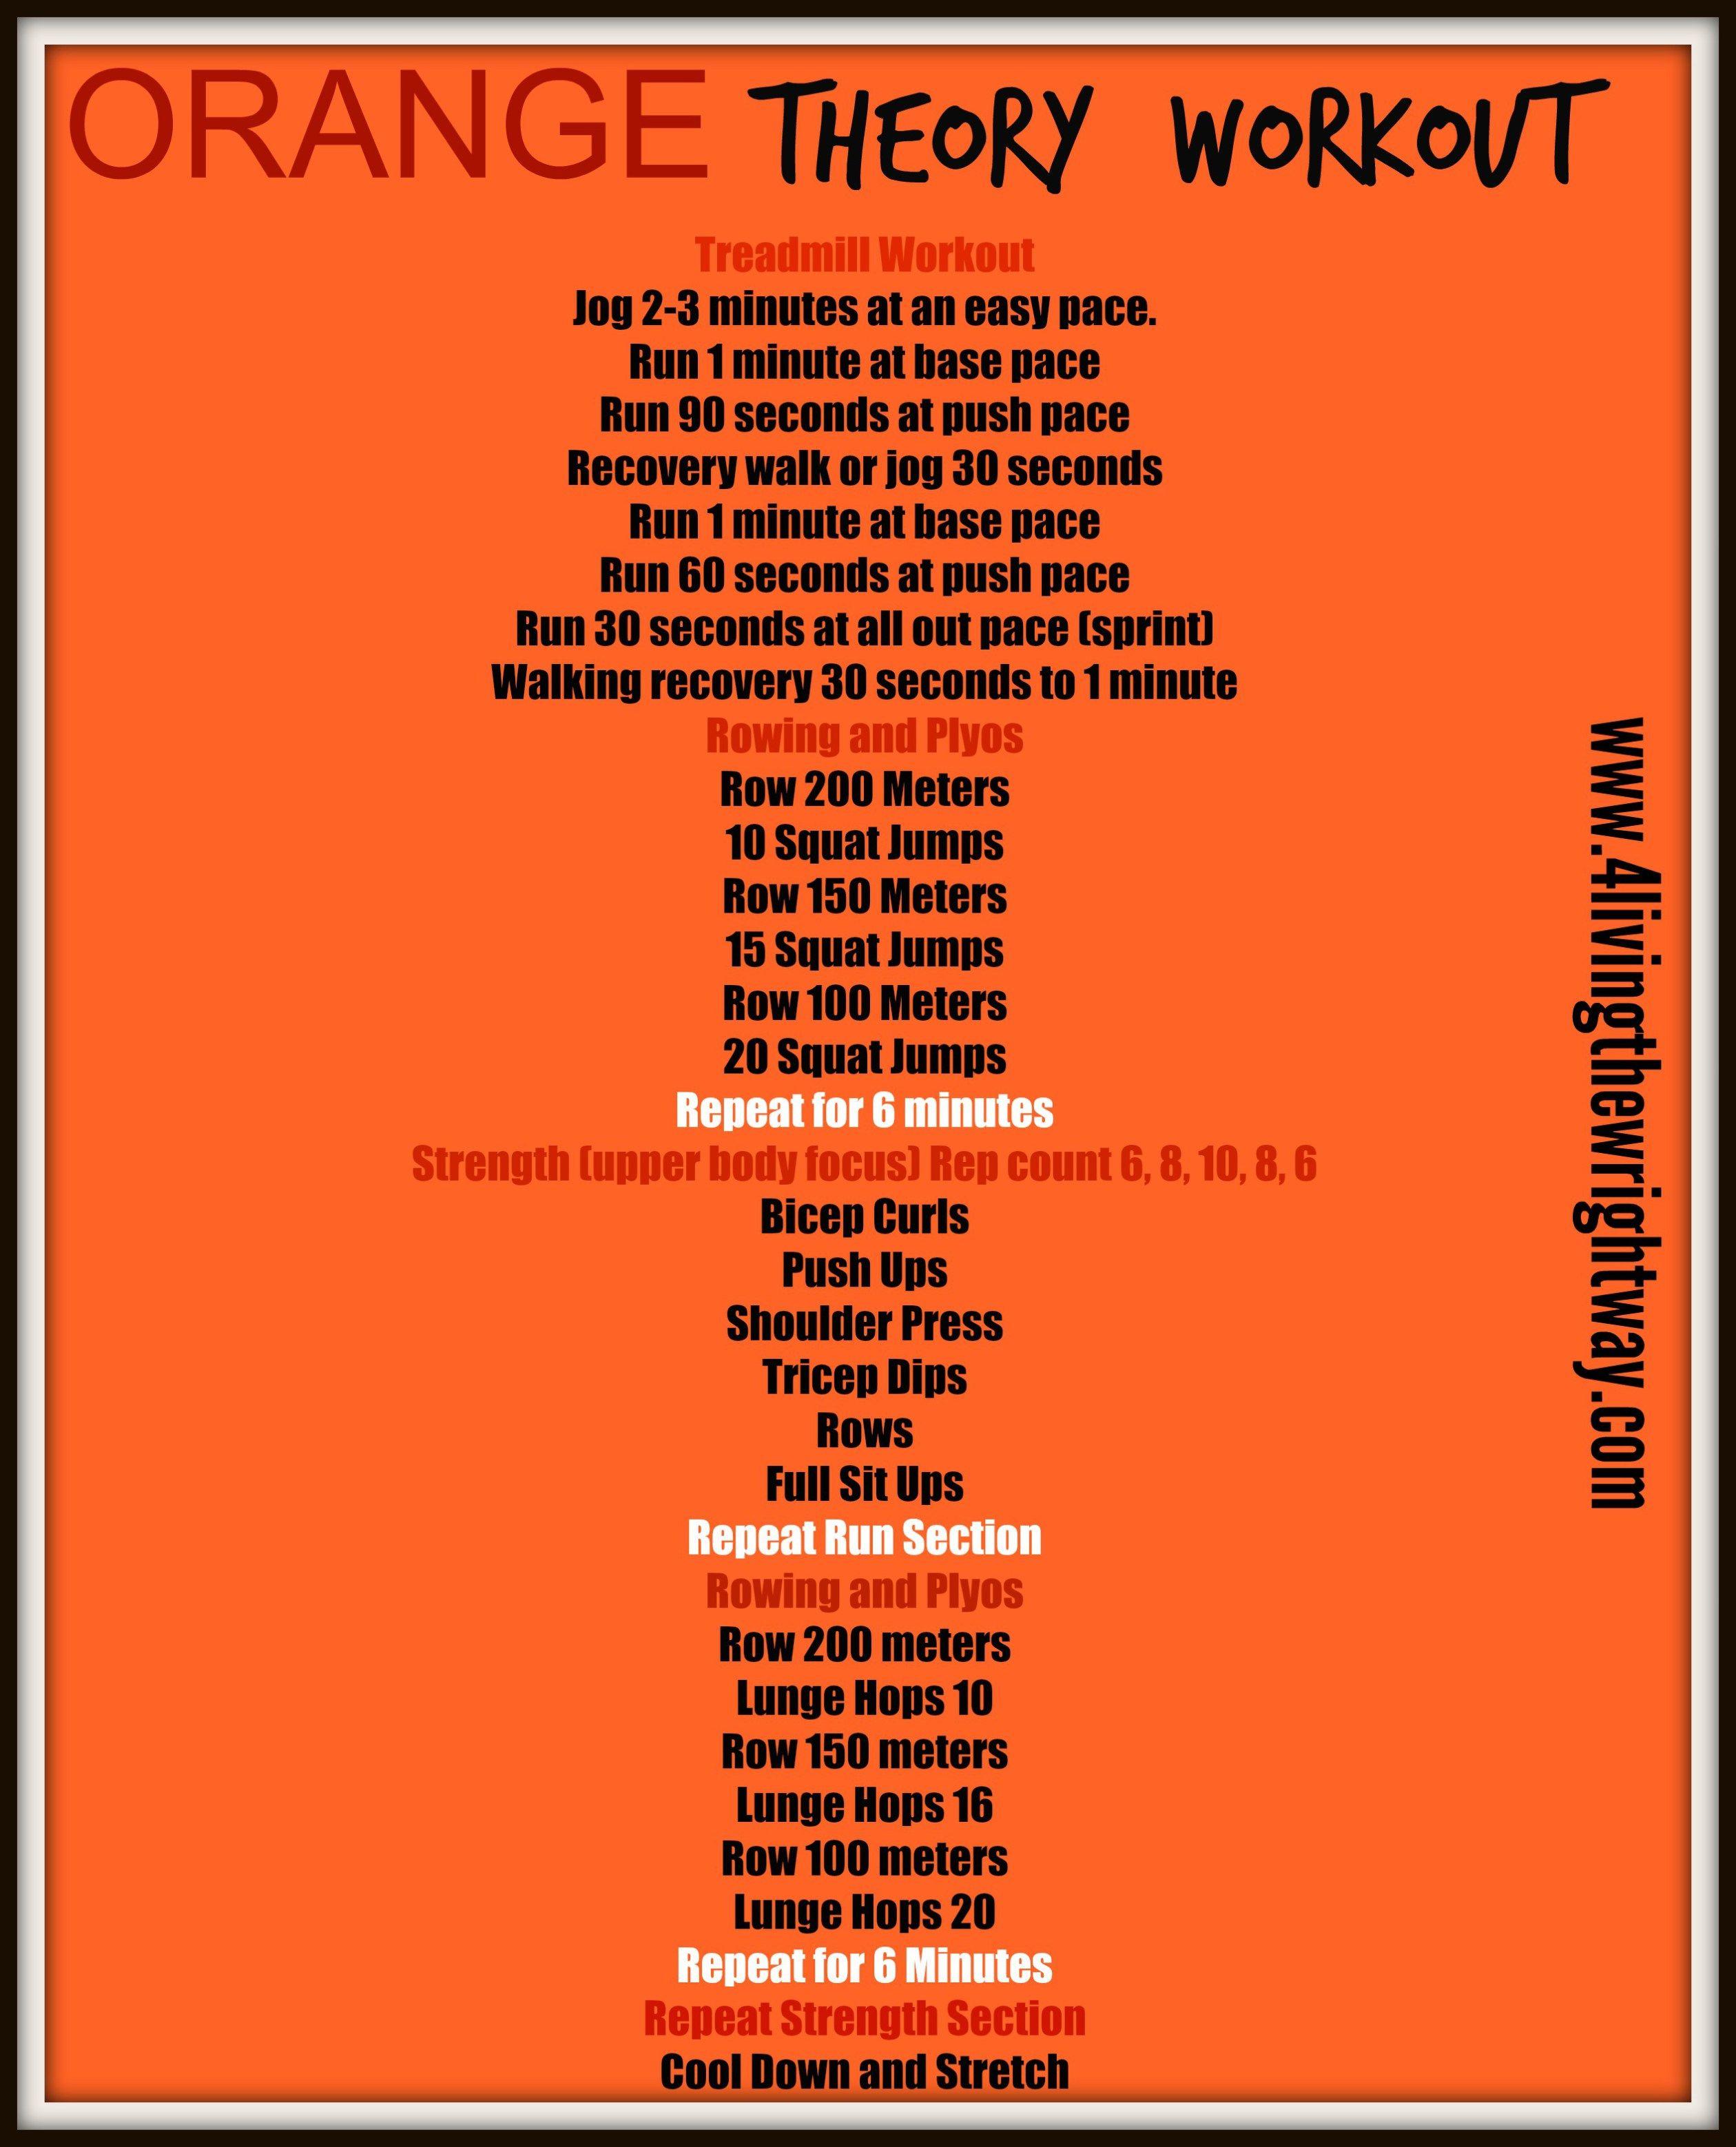 Circuito Hiit En Casa : Orange theory workout hiit